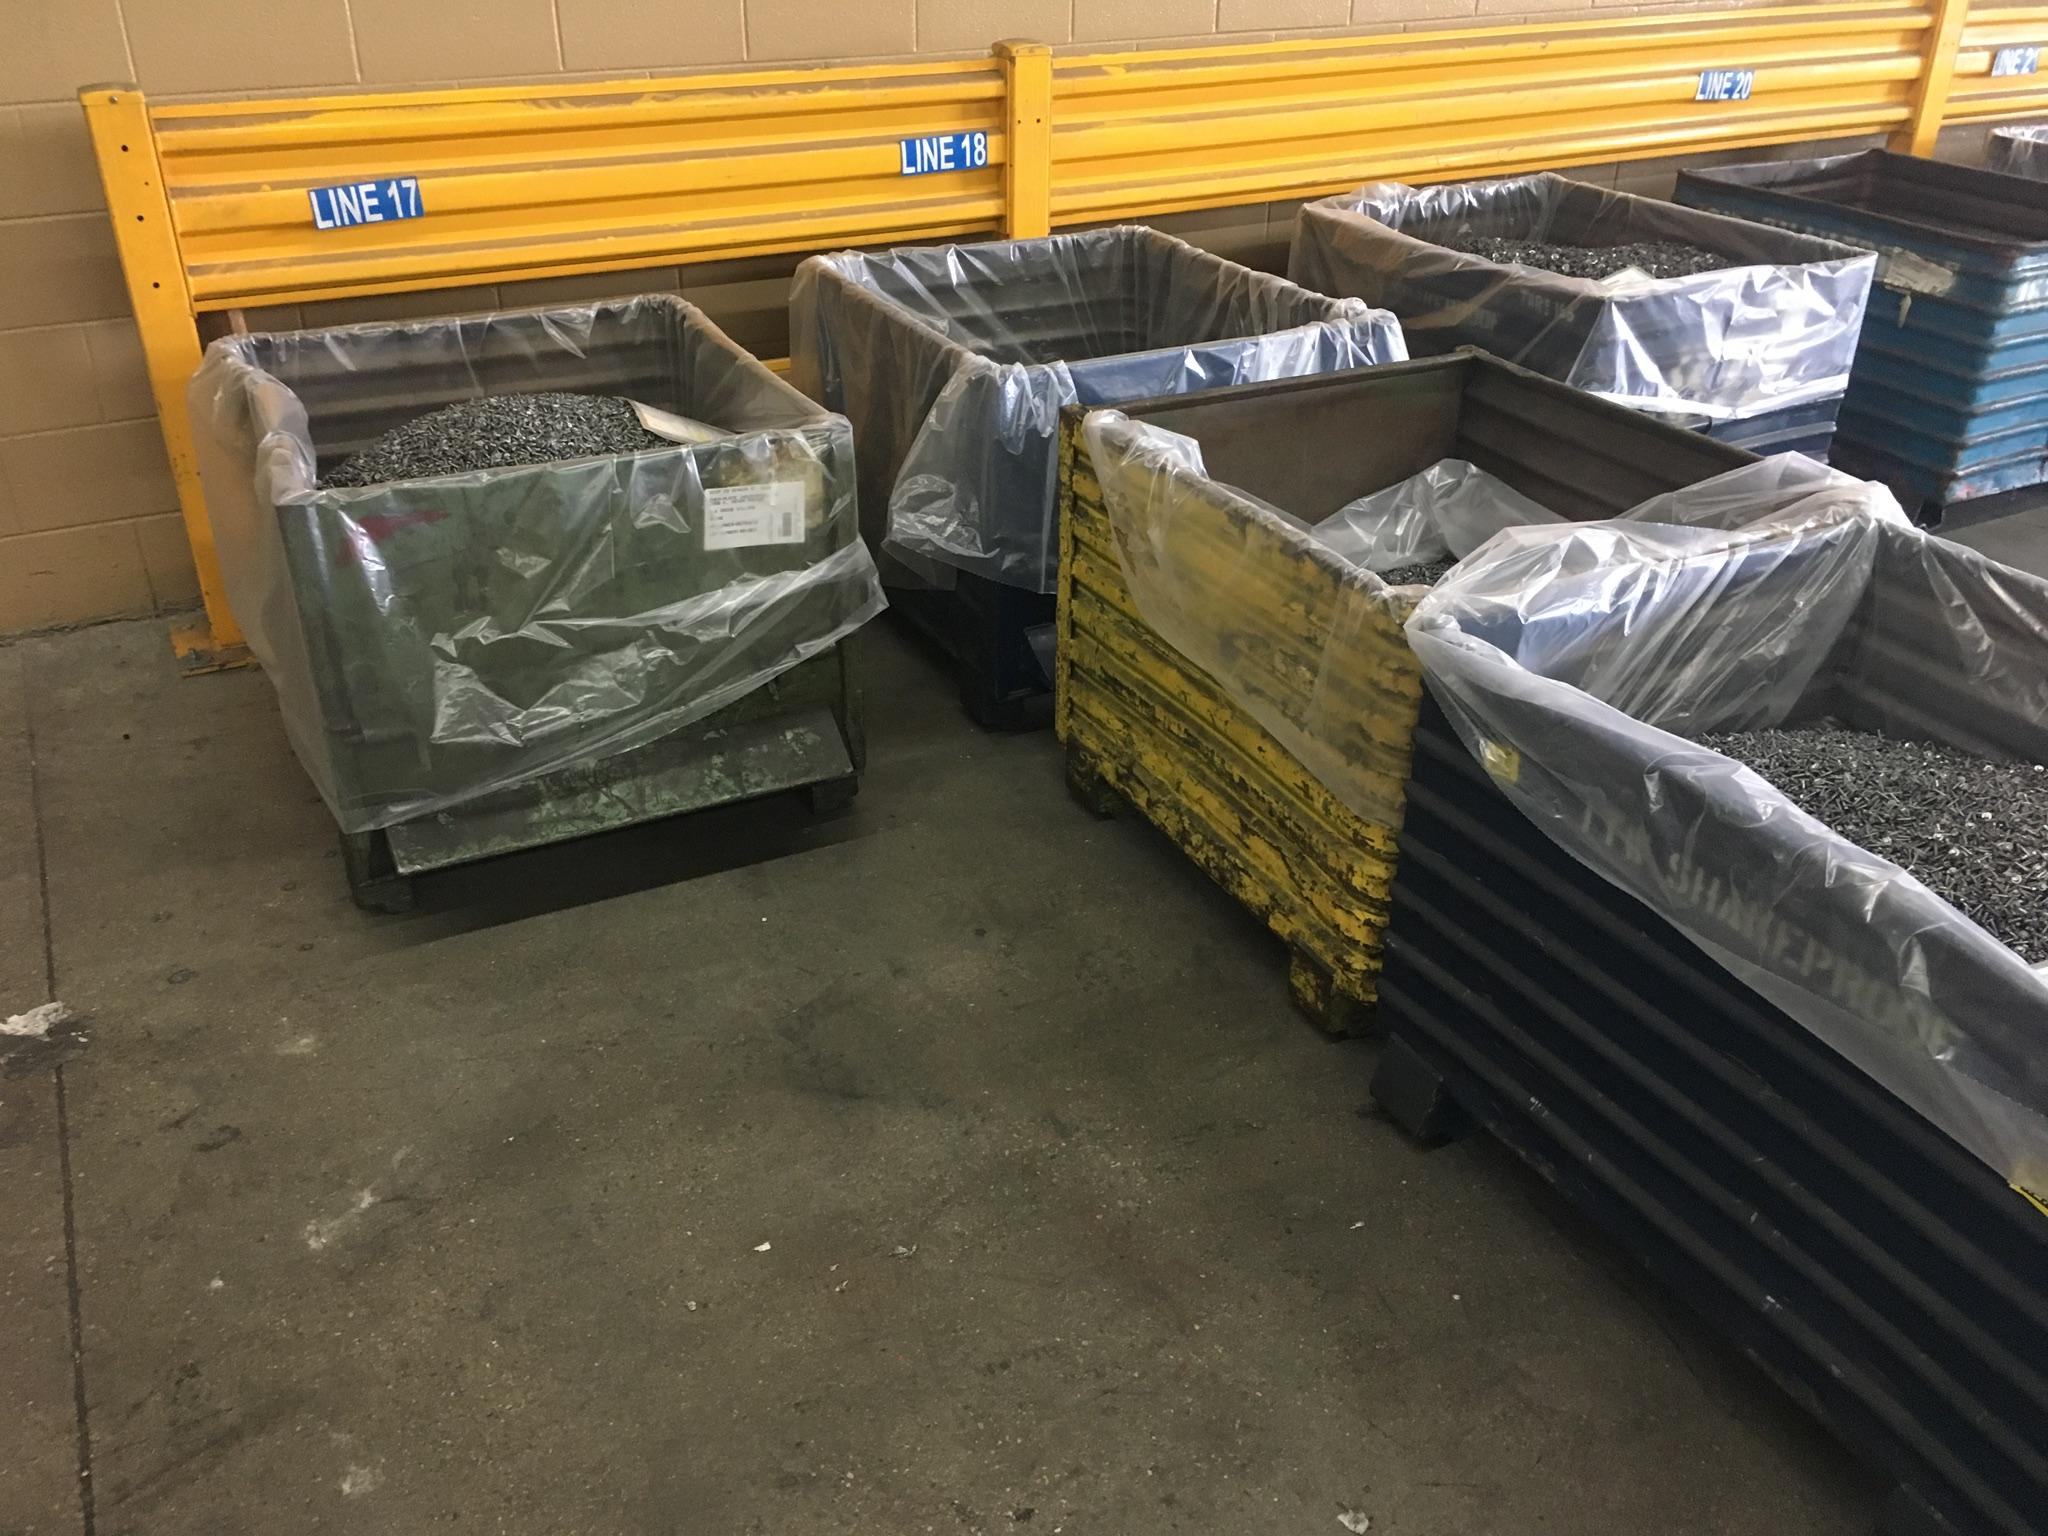 Bins Stored on Floor